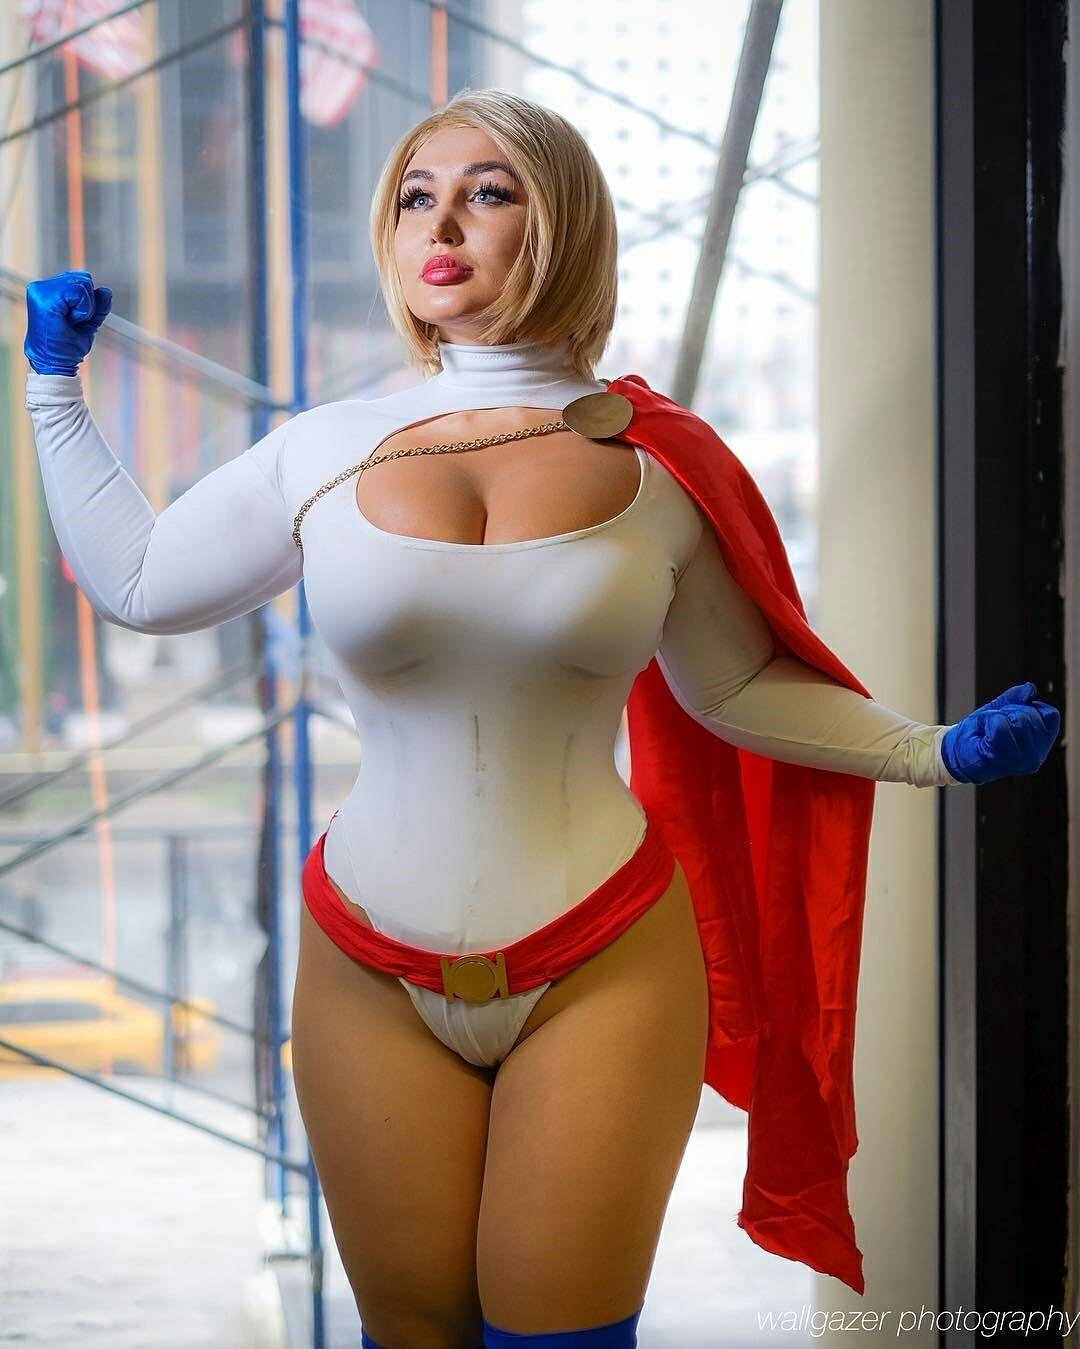 Powergirl Cosplay – Sofia Sivan – Photo by Wallgazer